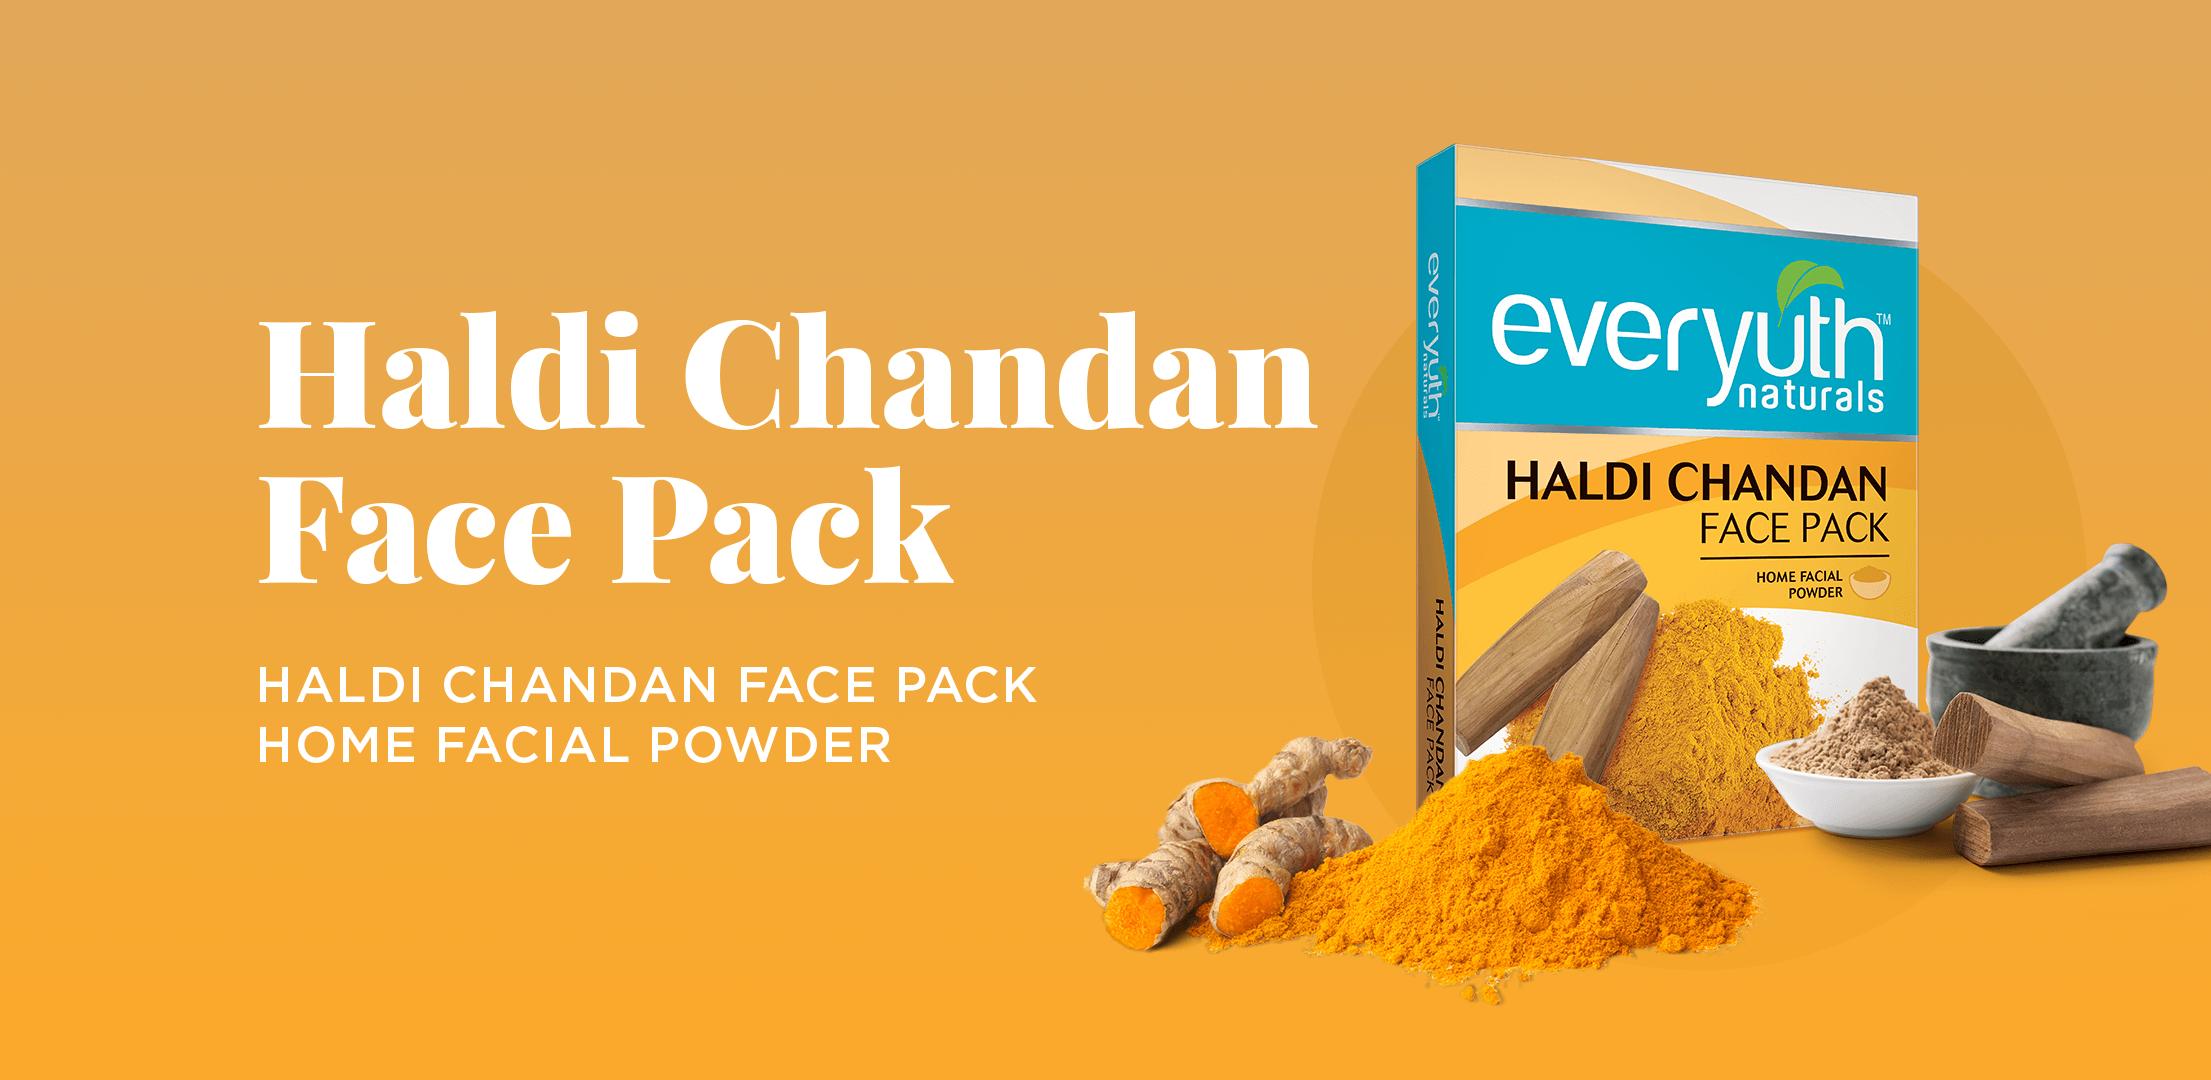 Haldi Chandan